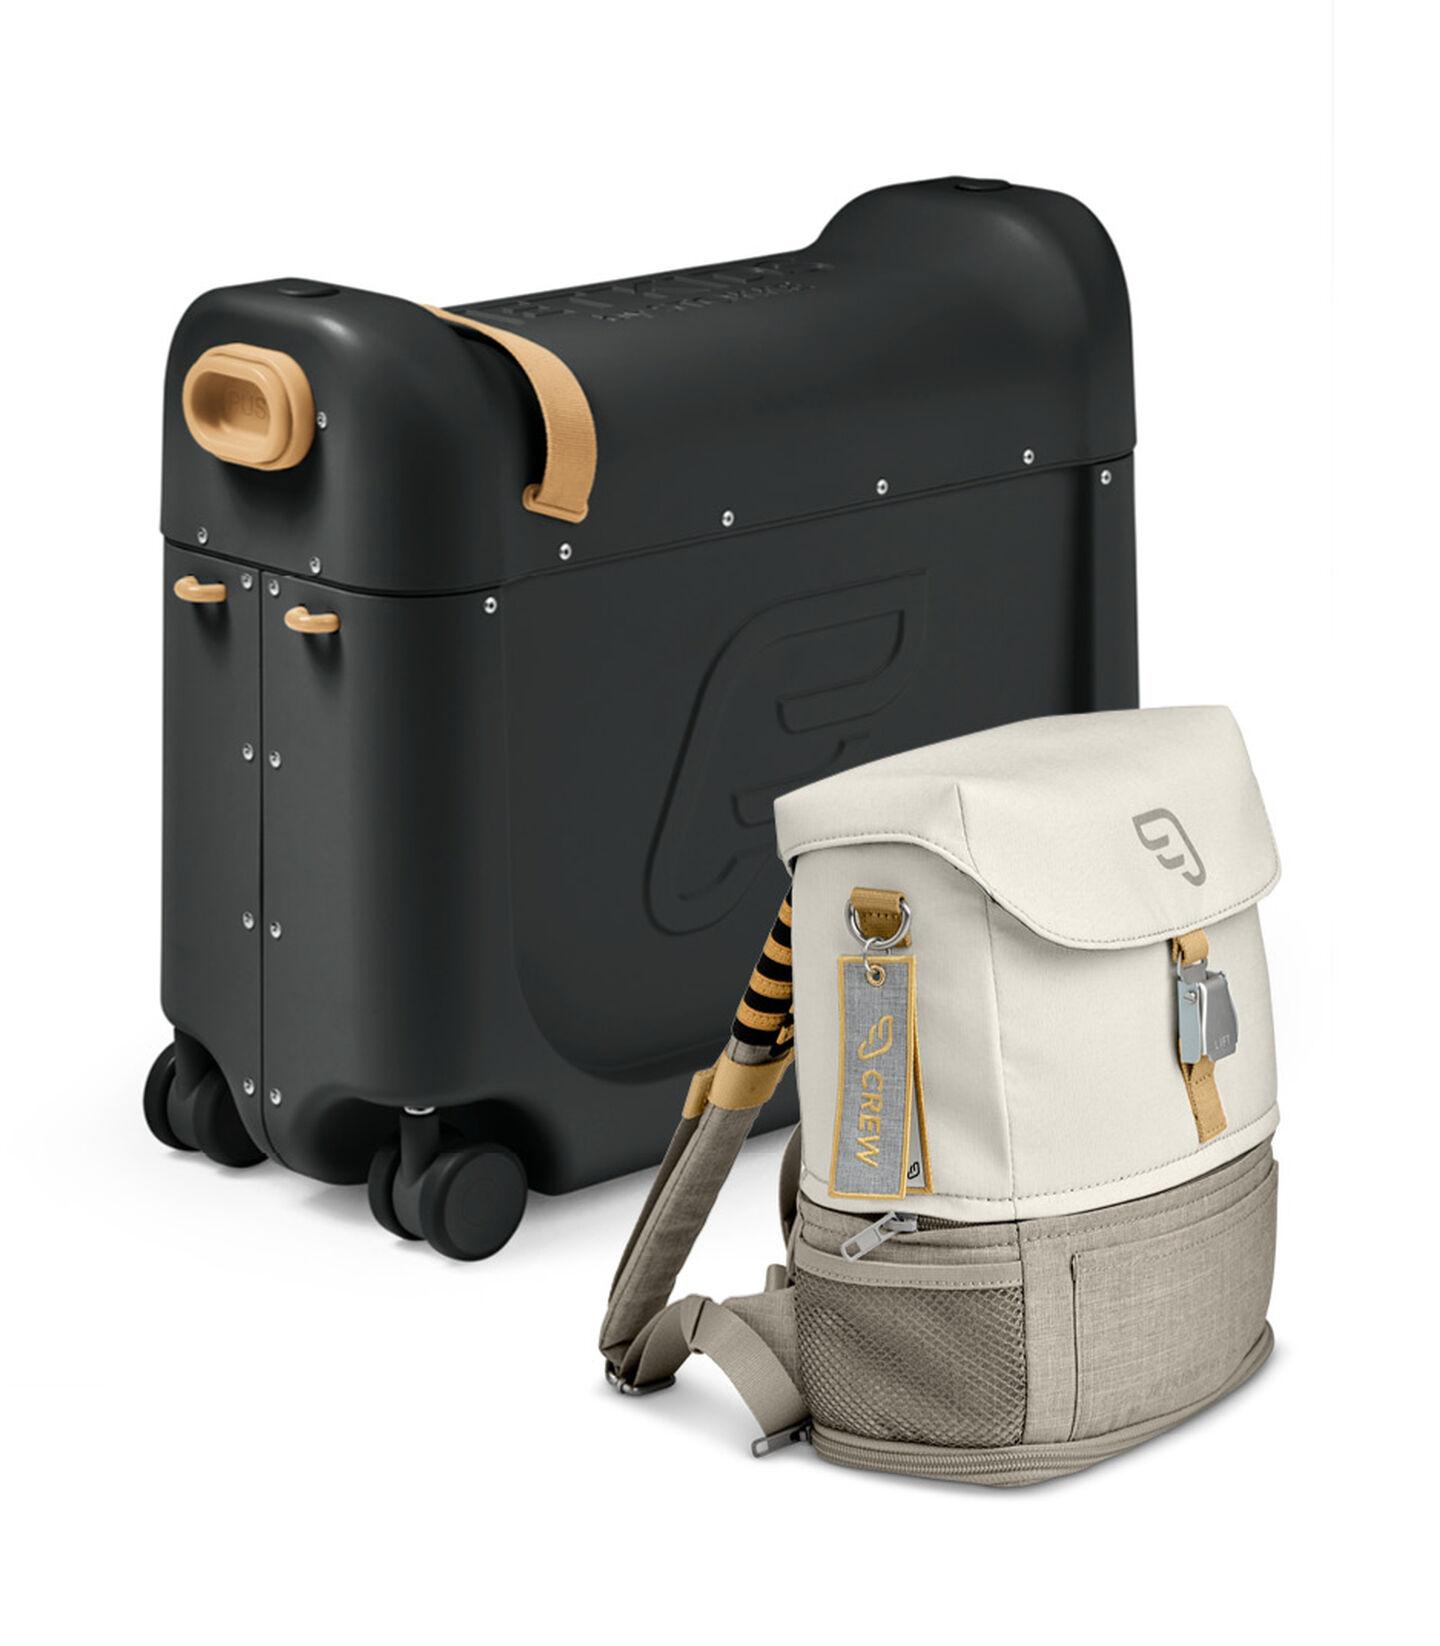 Travel bundle BedBox™ + Crew BackPack™ Black/White, Black / White, mainview view 2